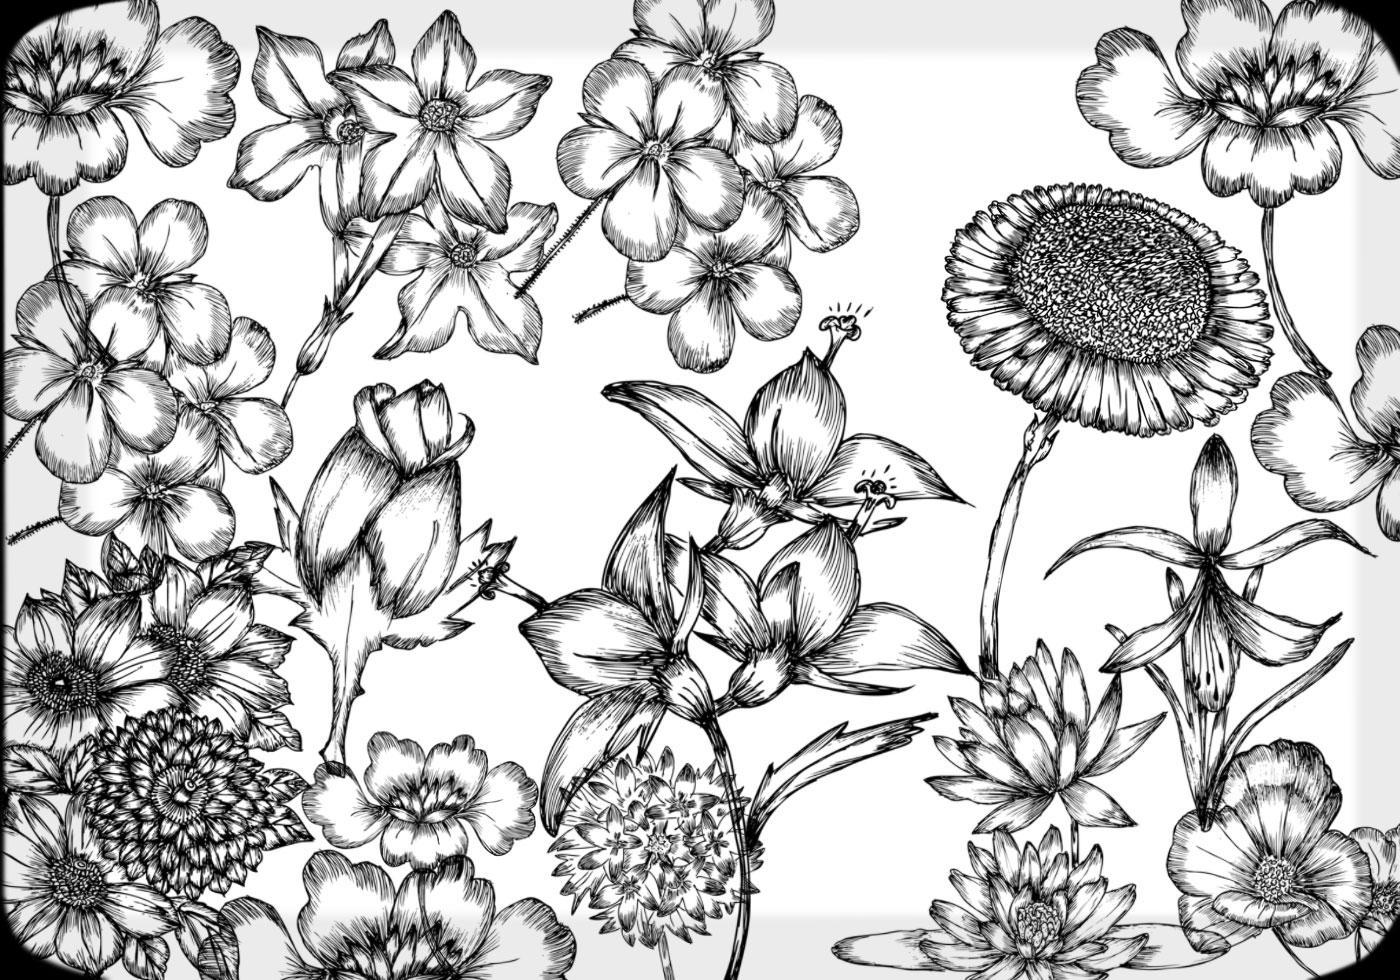 Hand Drawn Flowers Free Brush Pack Free Photoshop Brushes At